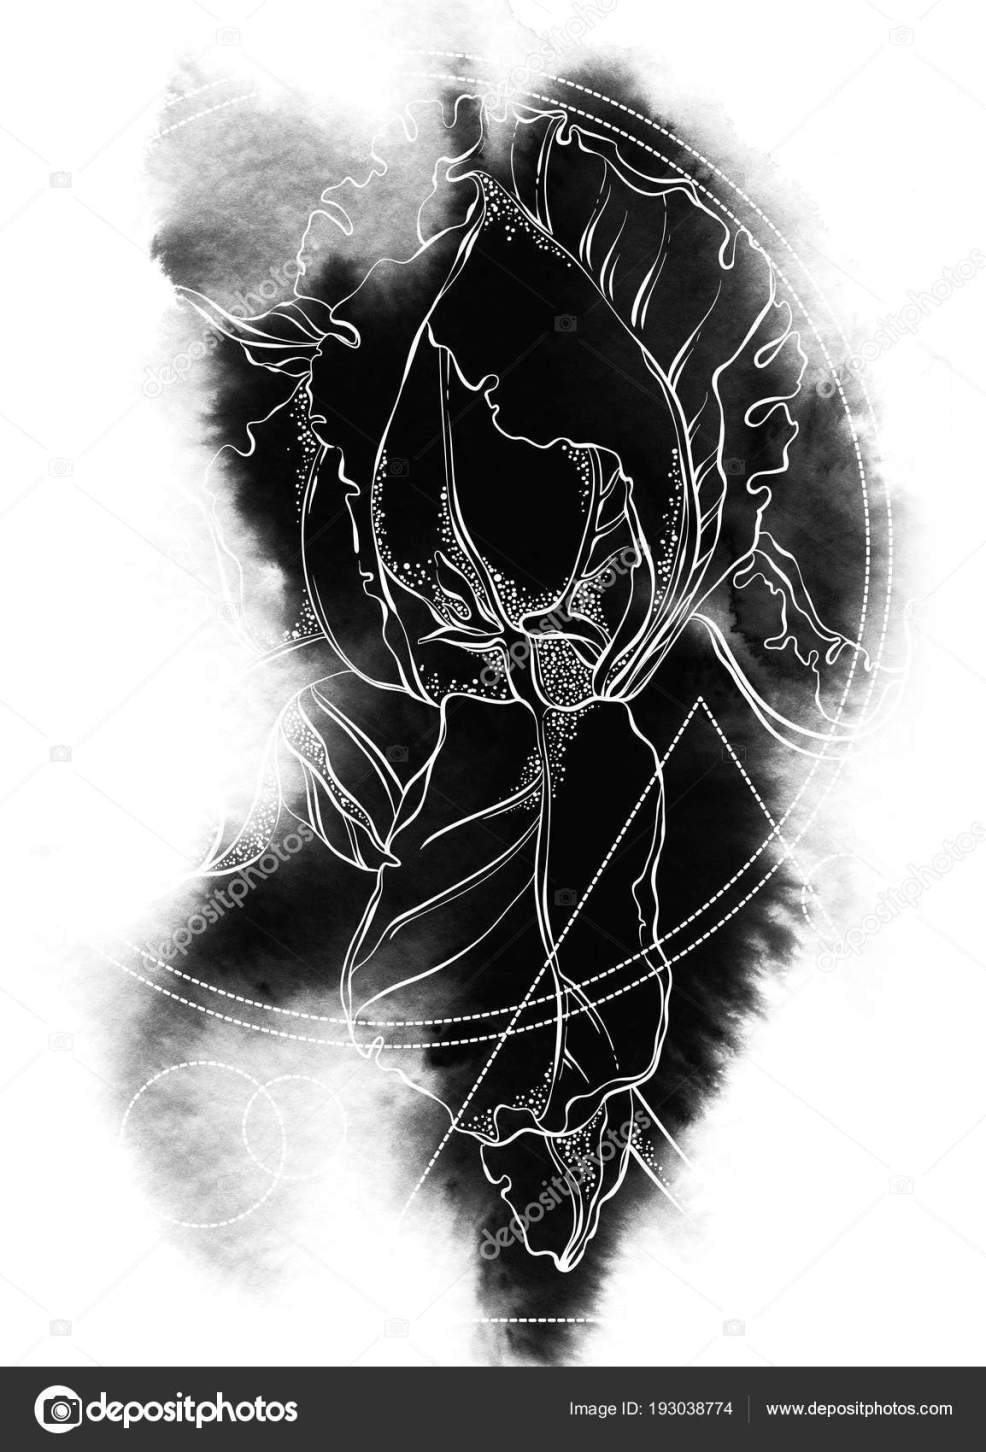 эскиз татуировки цветок ириса геометрические фигуры пятно краски